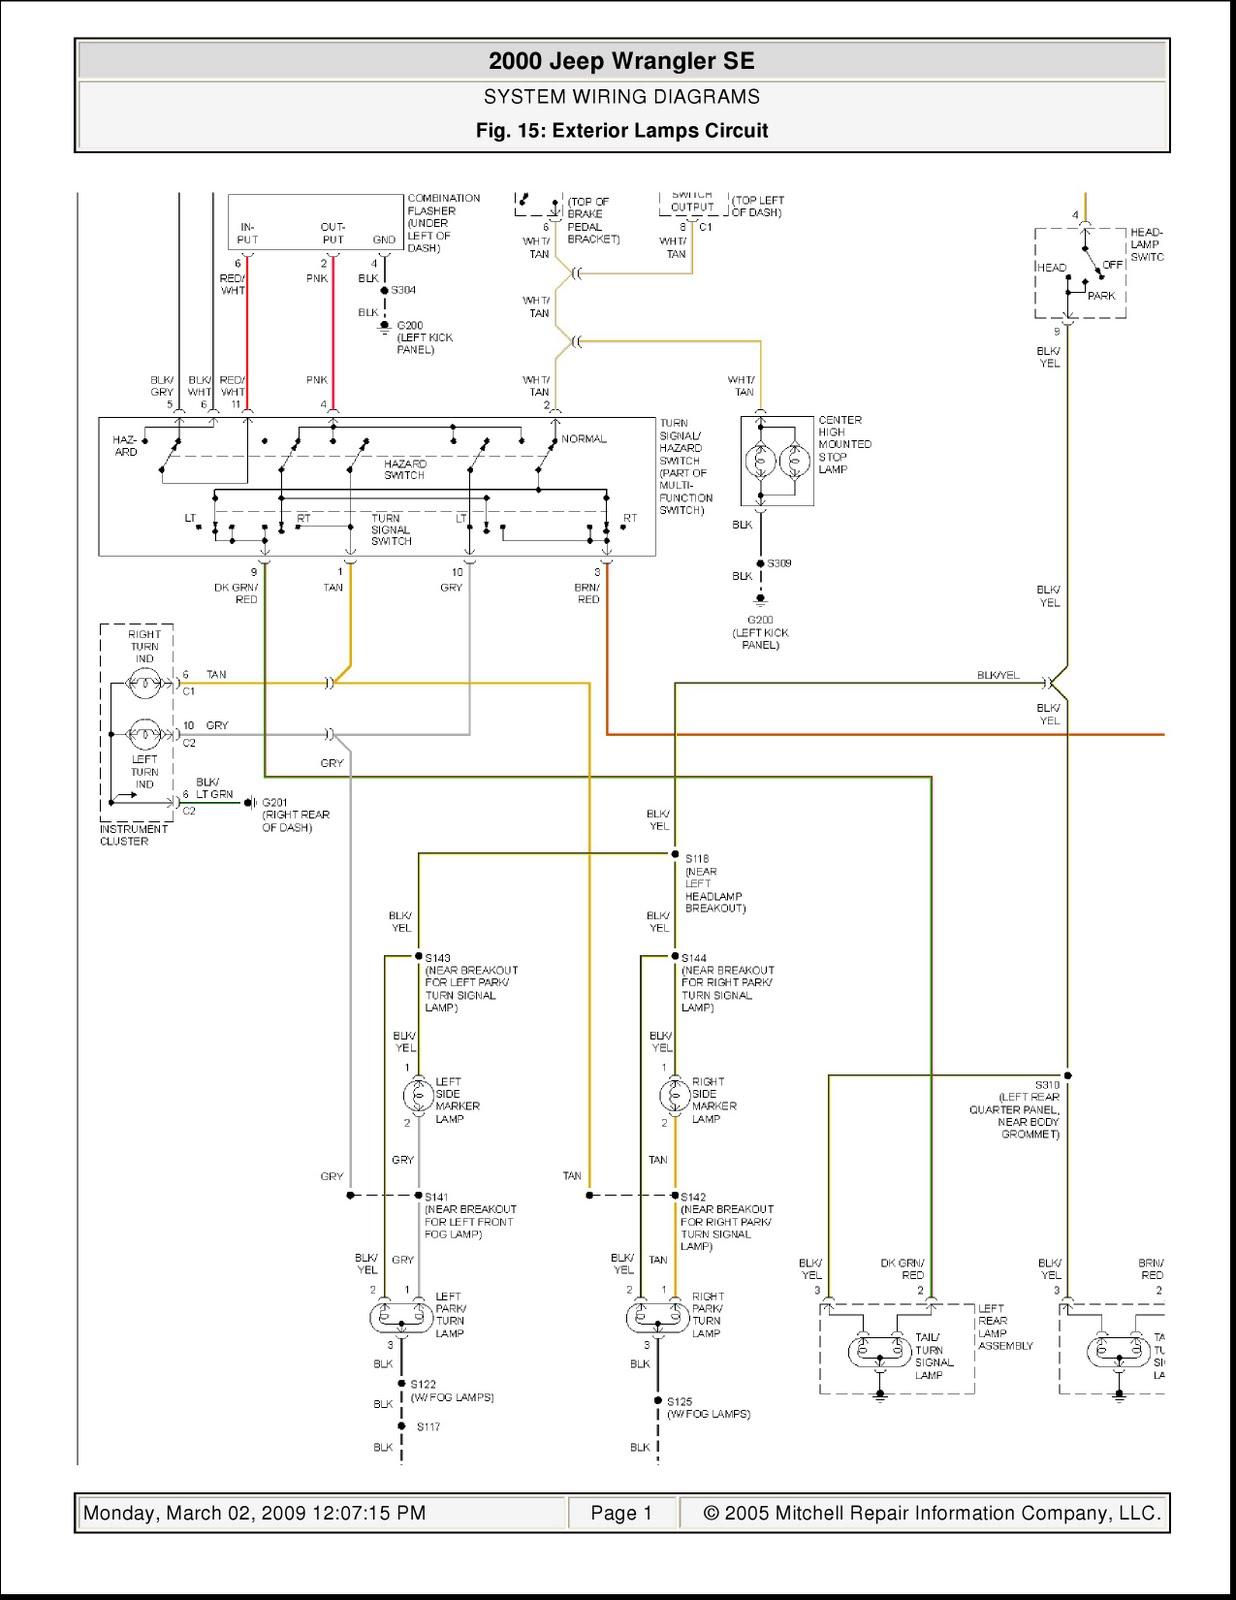 0001 Jeep Tj Ke Light Wiring Diagram on